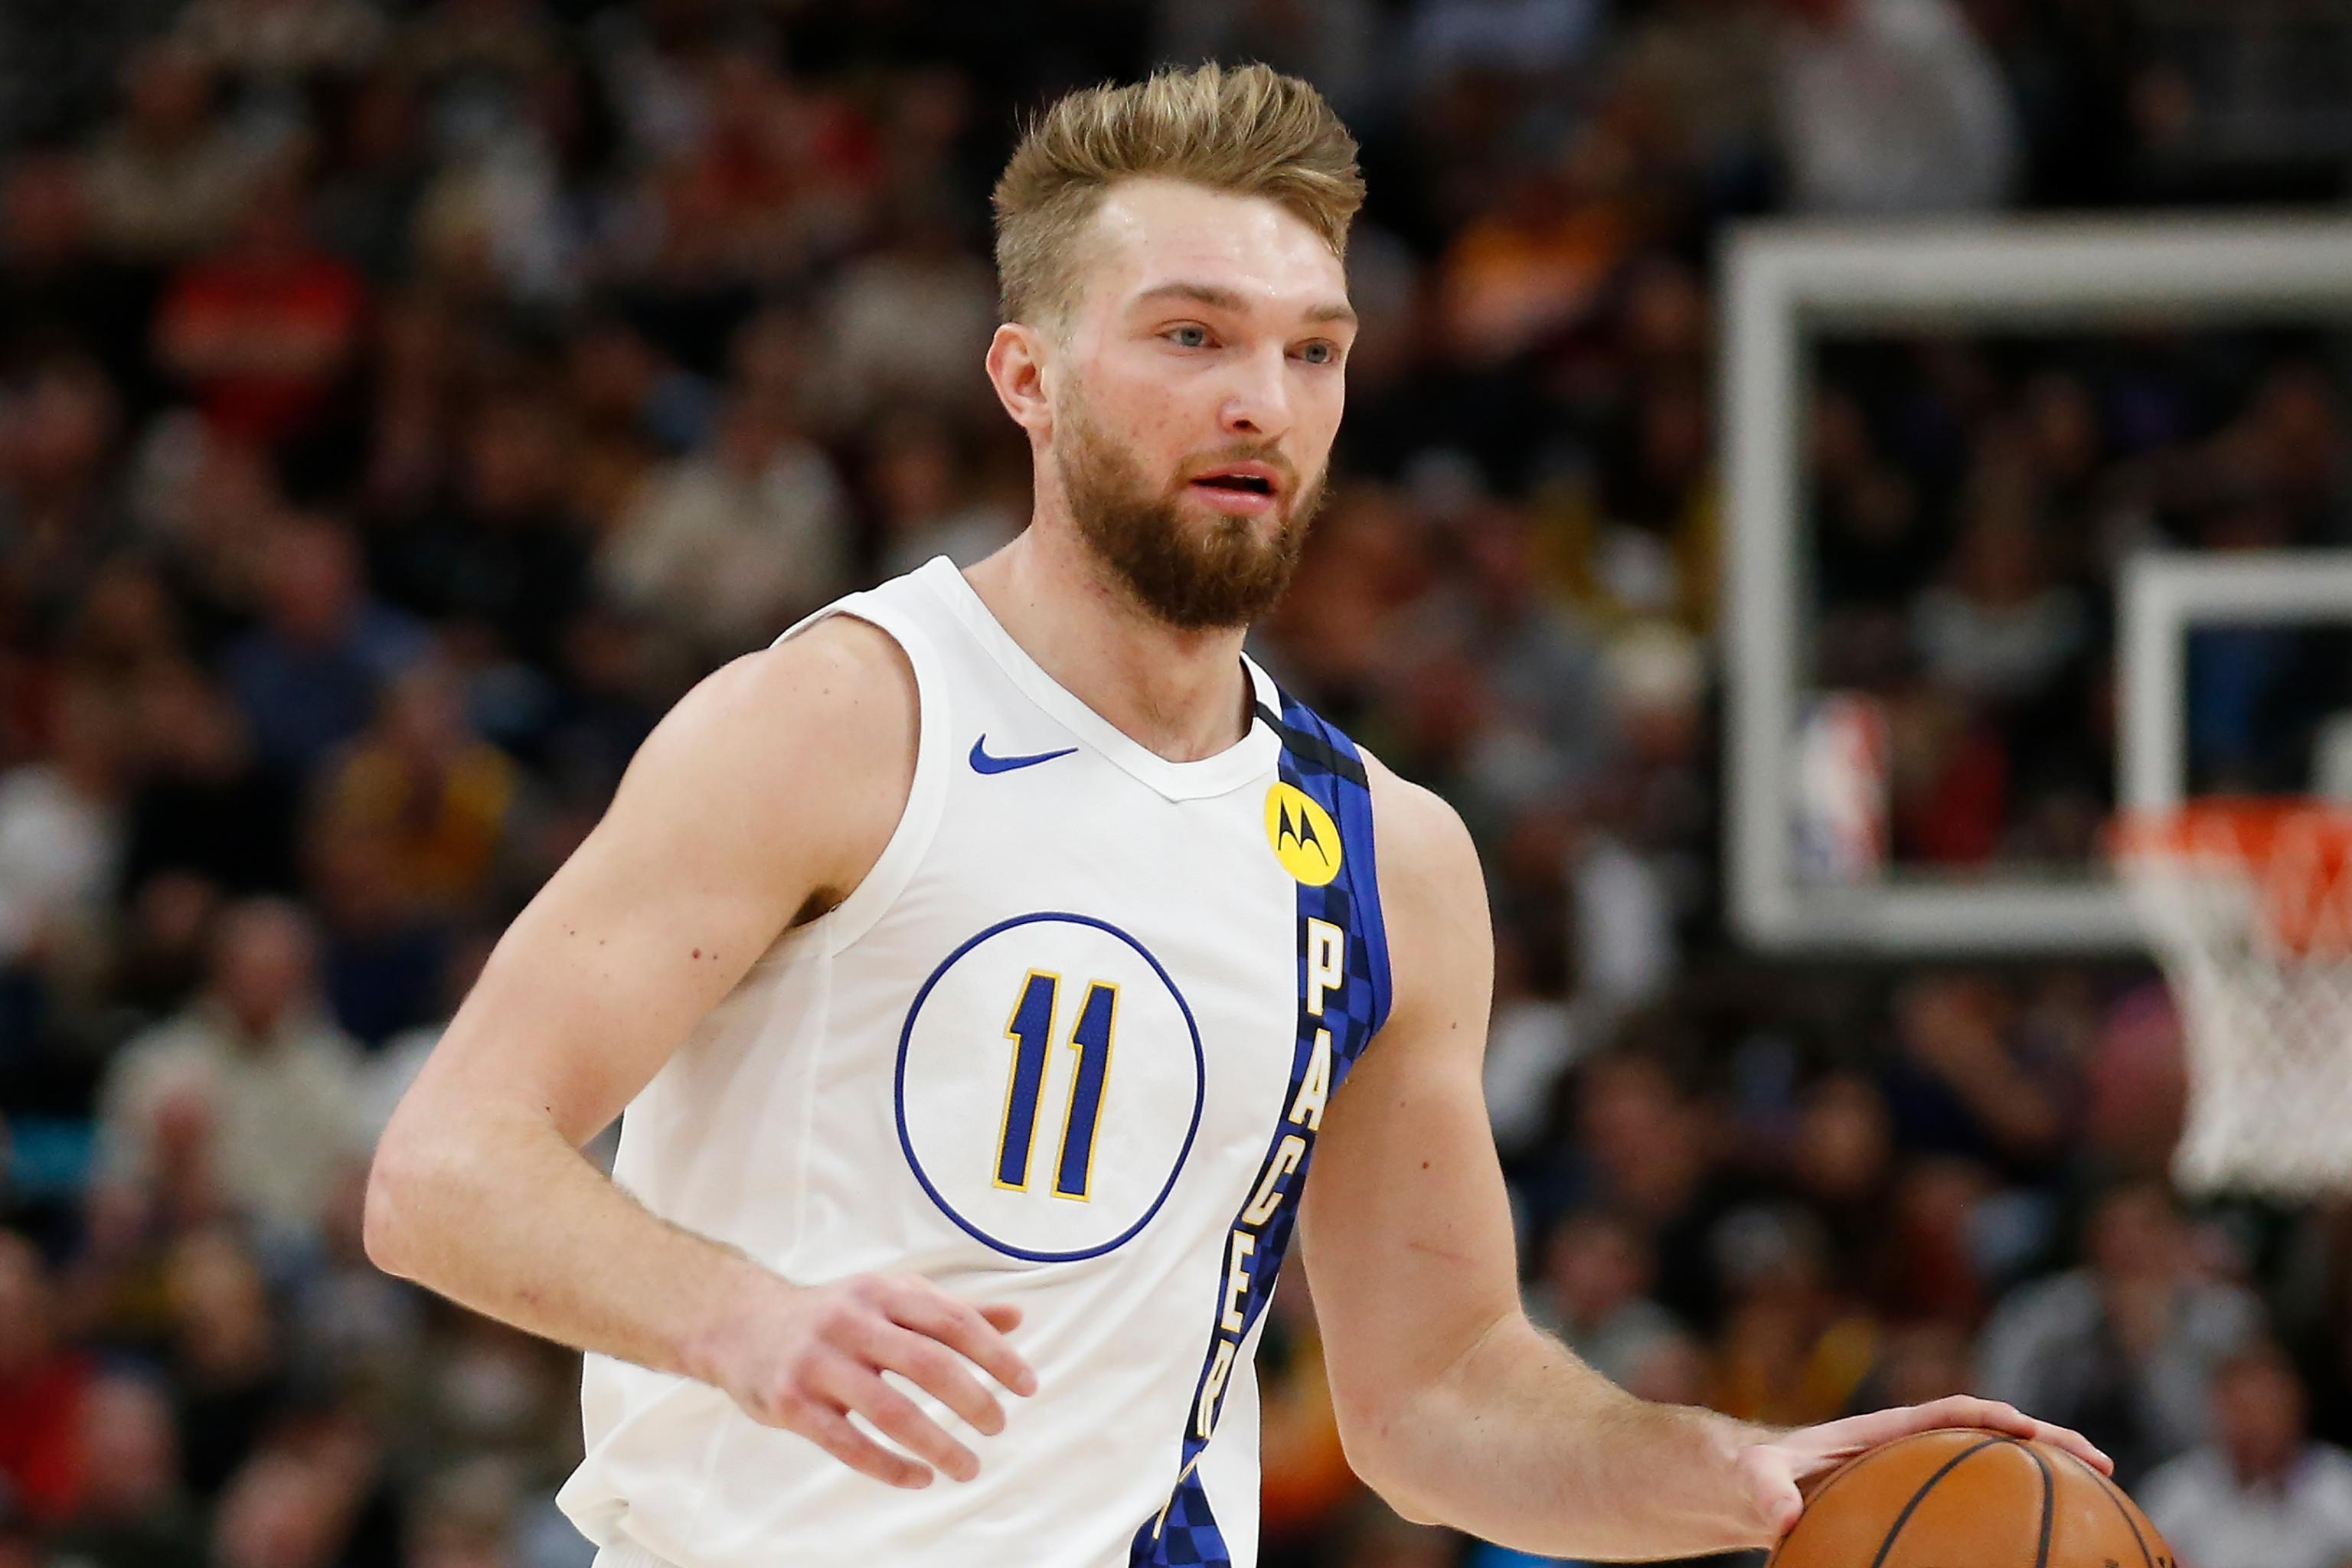 Domantas Sabonis de Indiana Pacers reemplaza a Kevin Durant en el All-Star Game